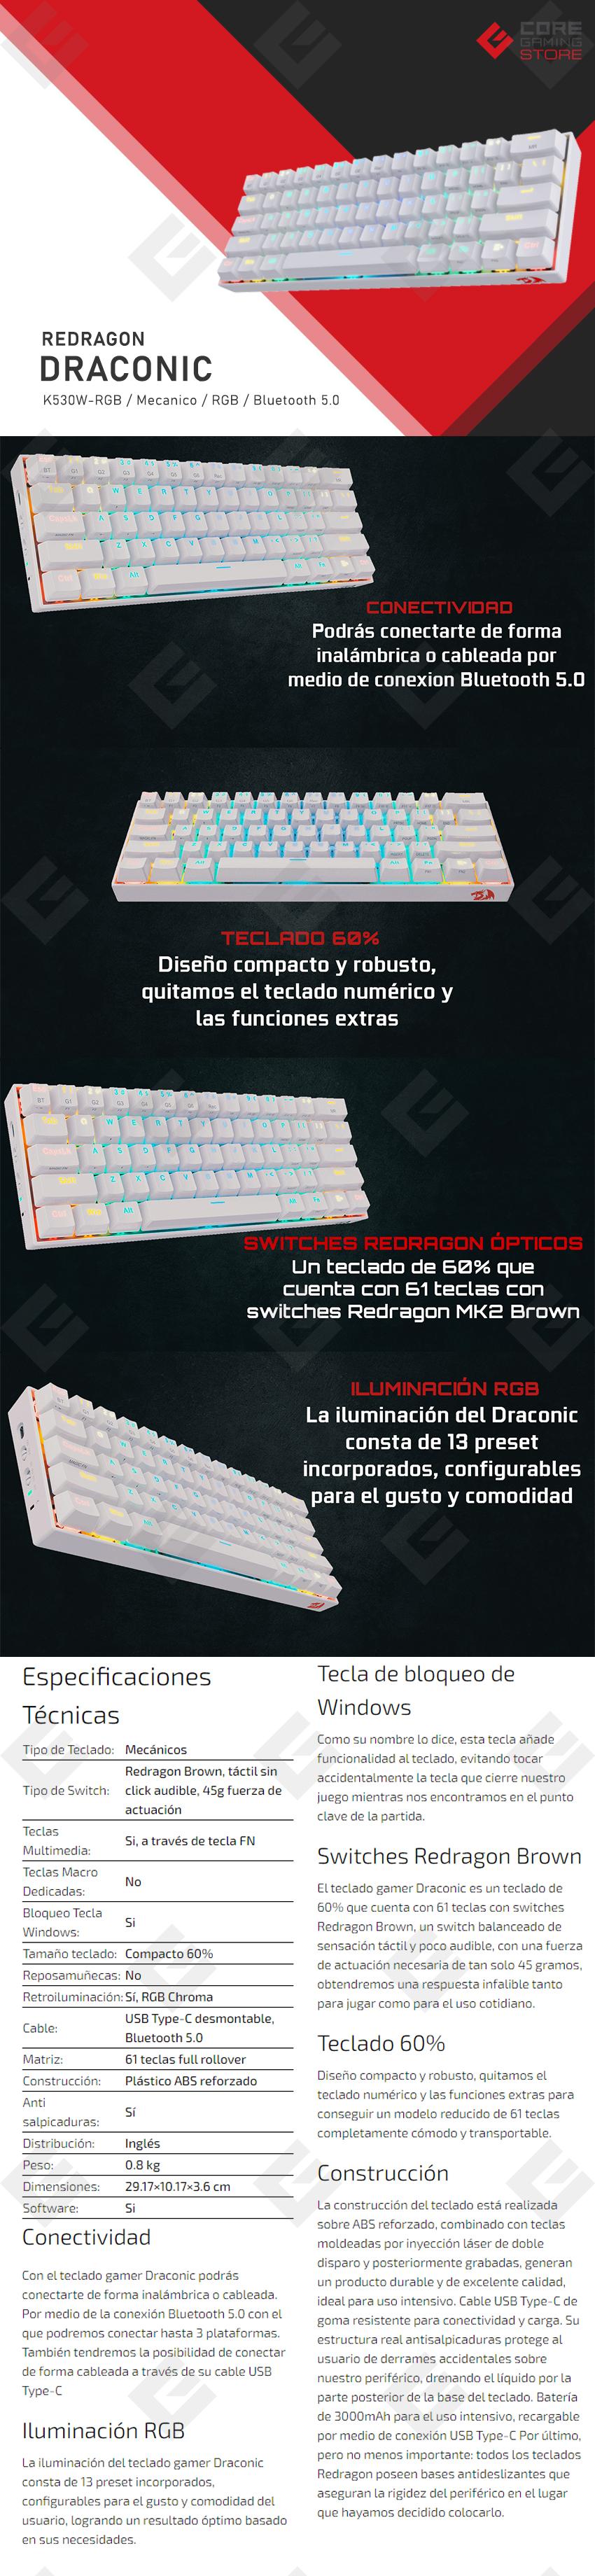 Teclado Mecanico Redragon Draconic K530W-RGB Blanco, 60%, Switches Redragon Brown